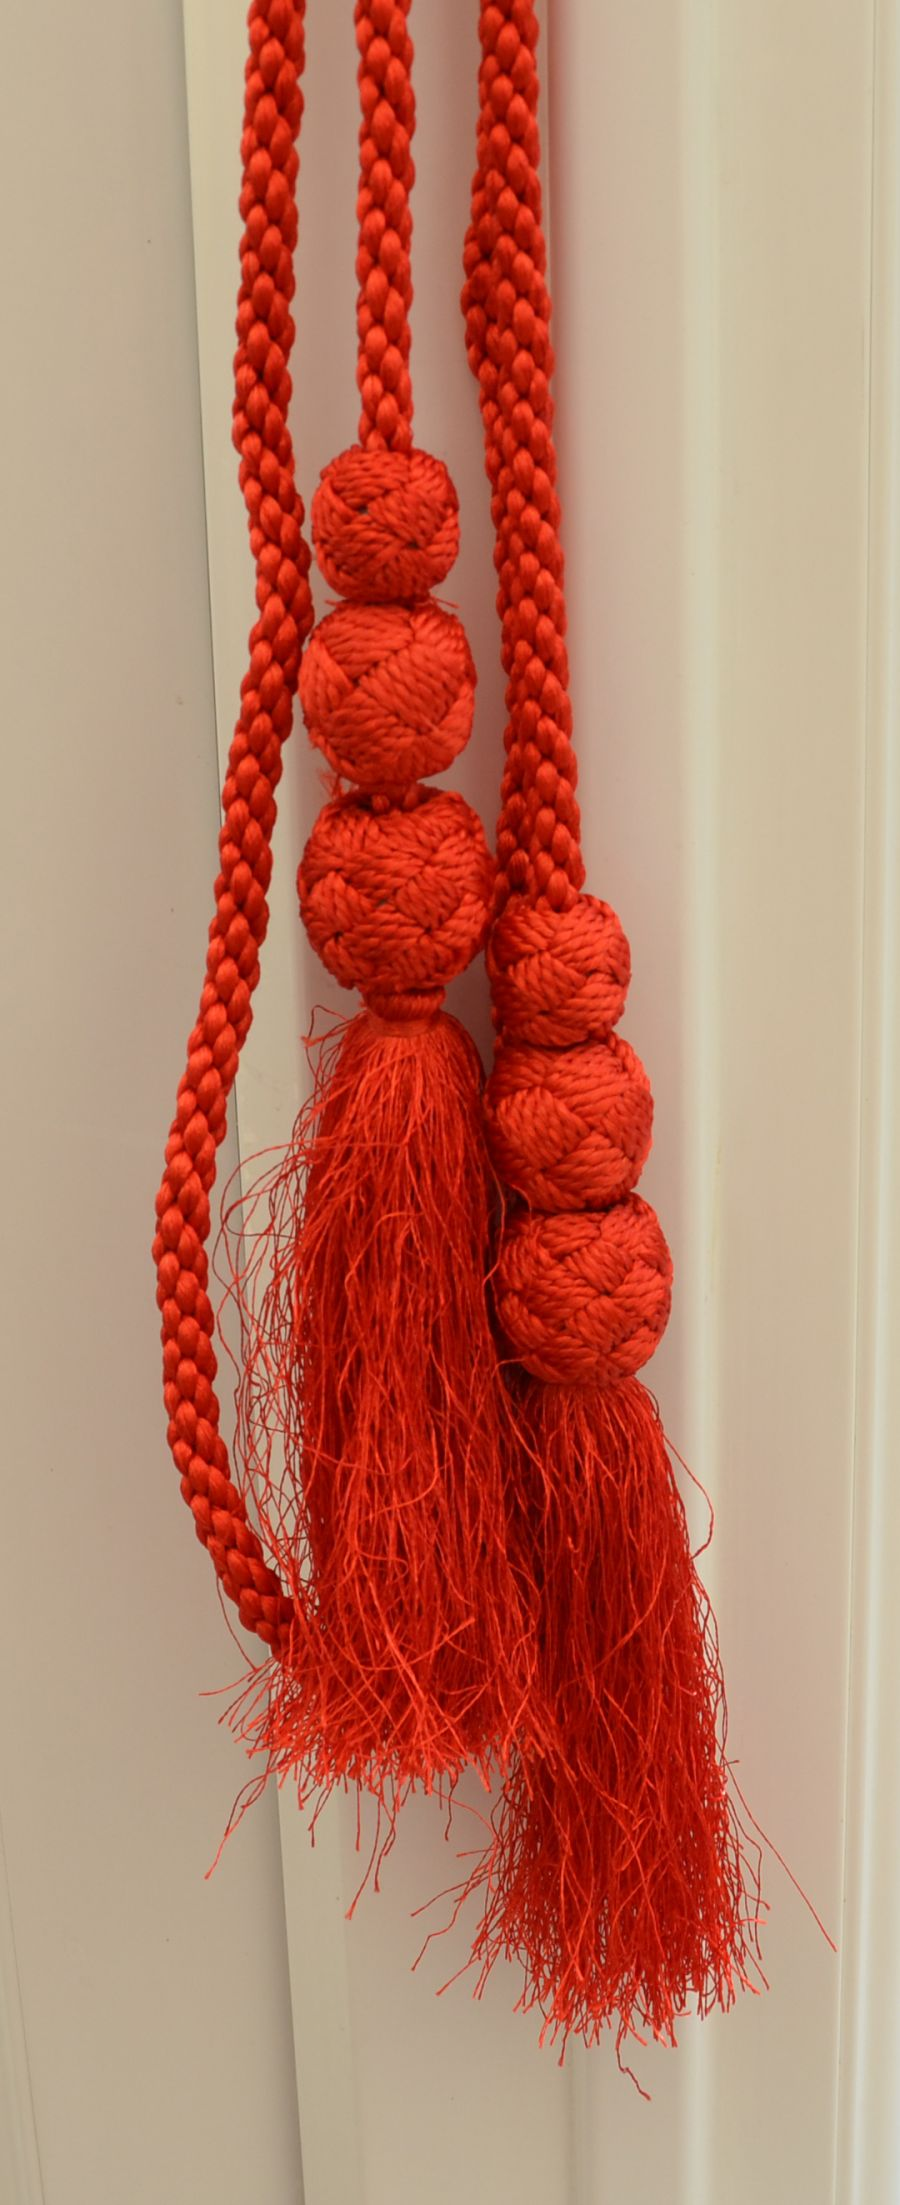 Scarlet Cord Members Cord with tassels